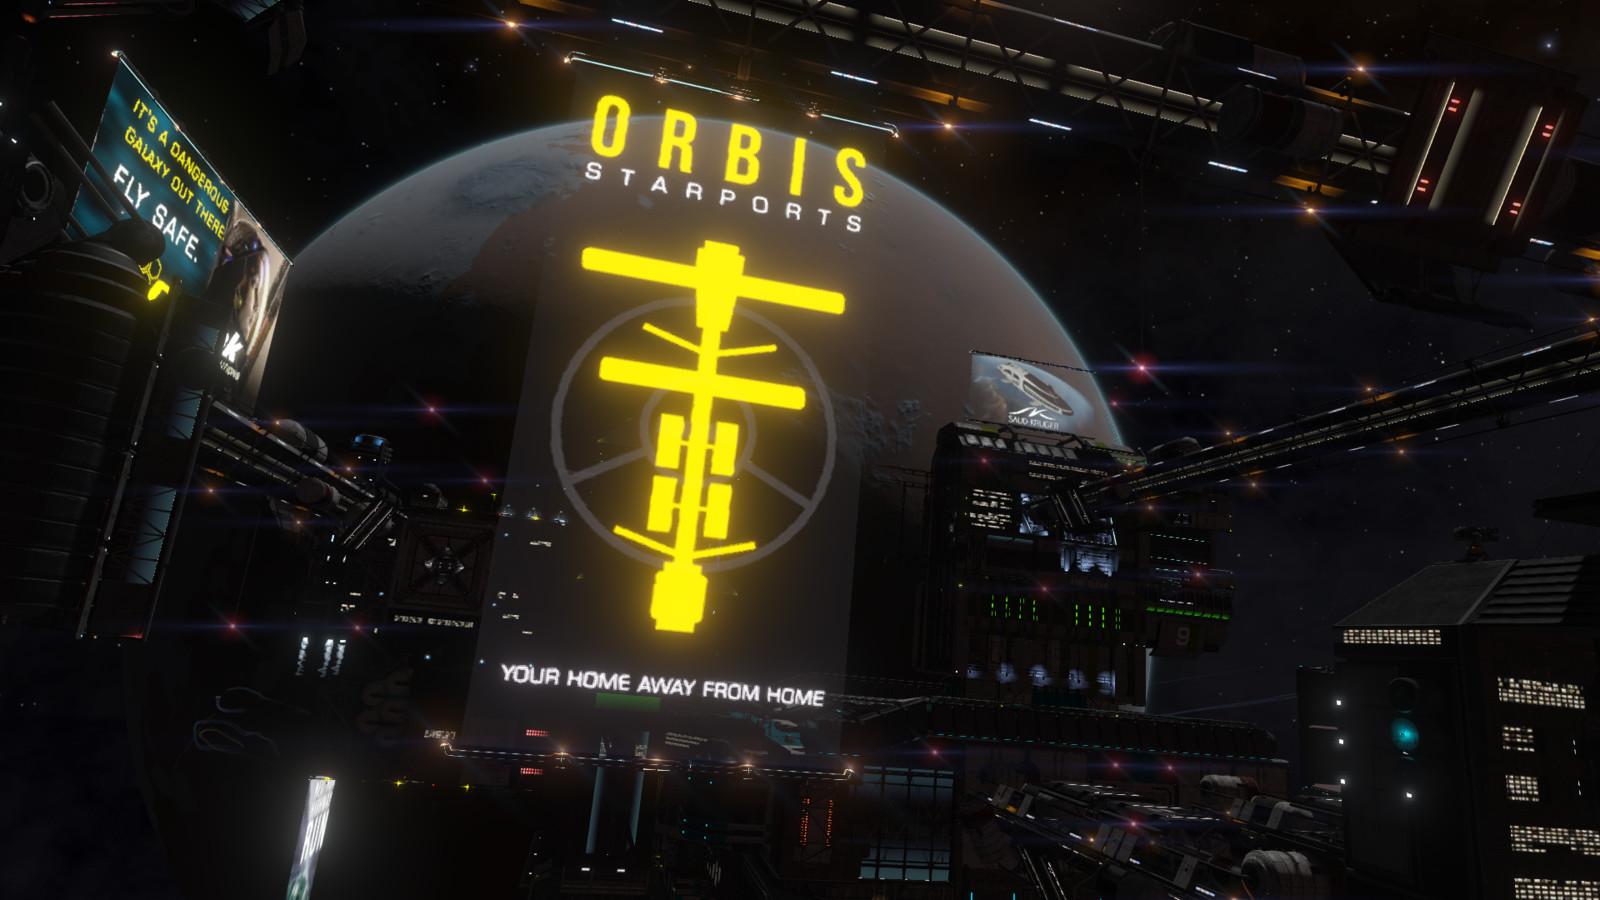 Orbis, in game.